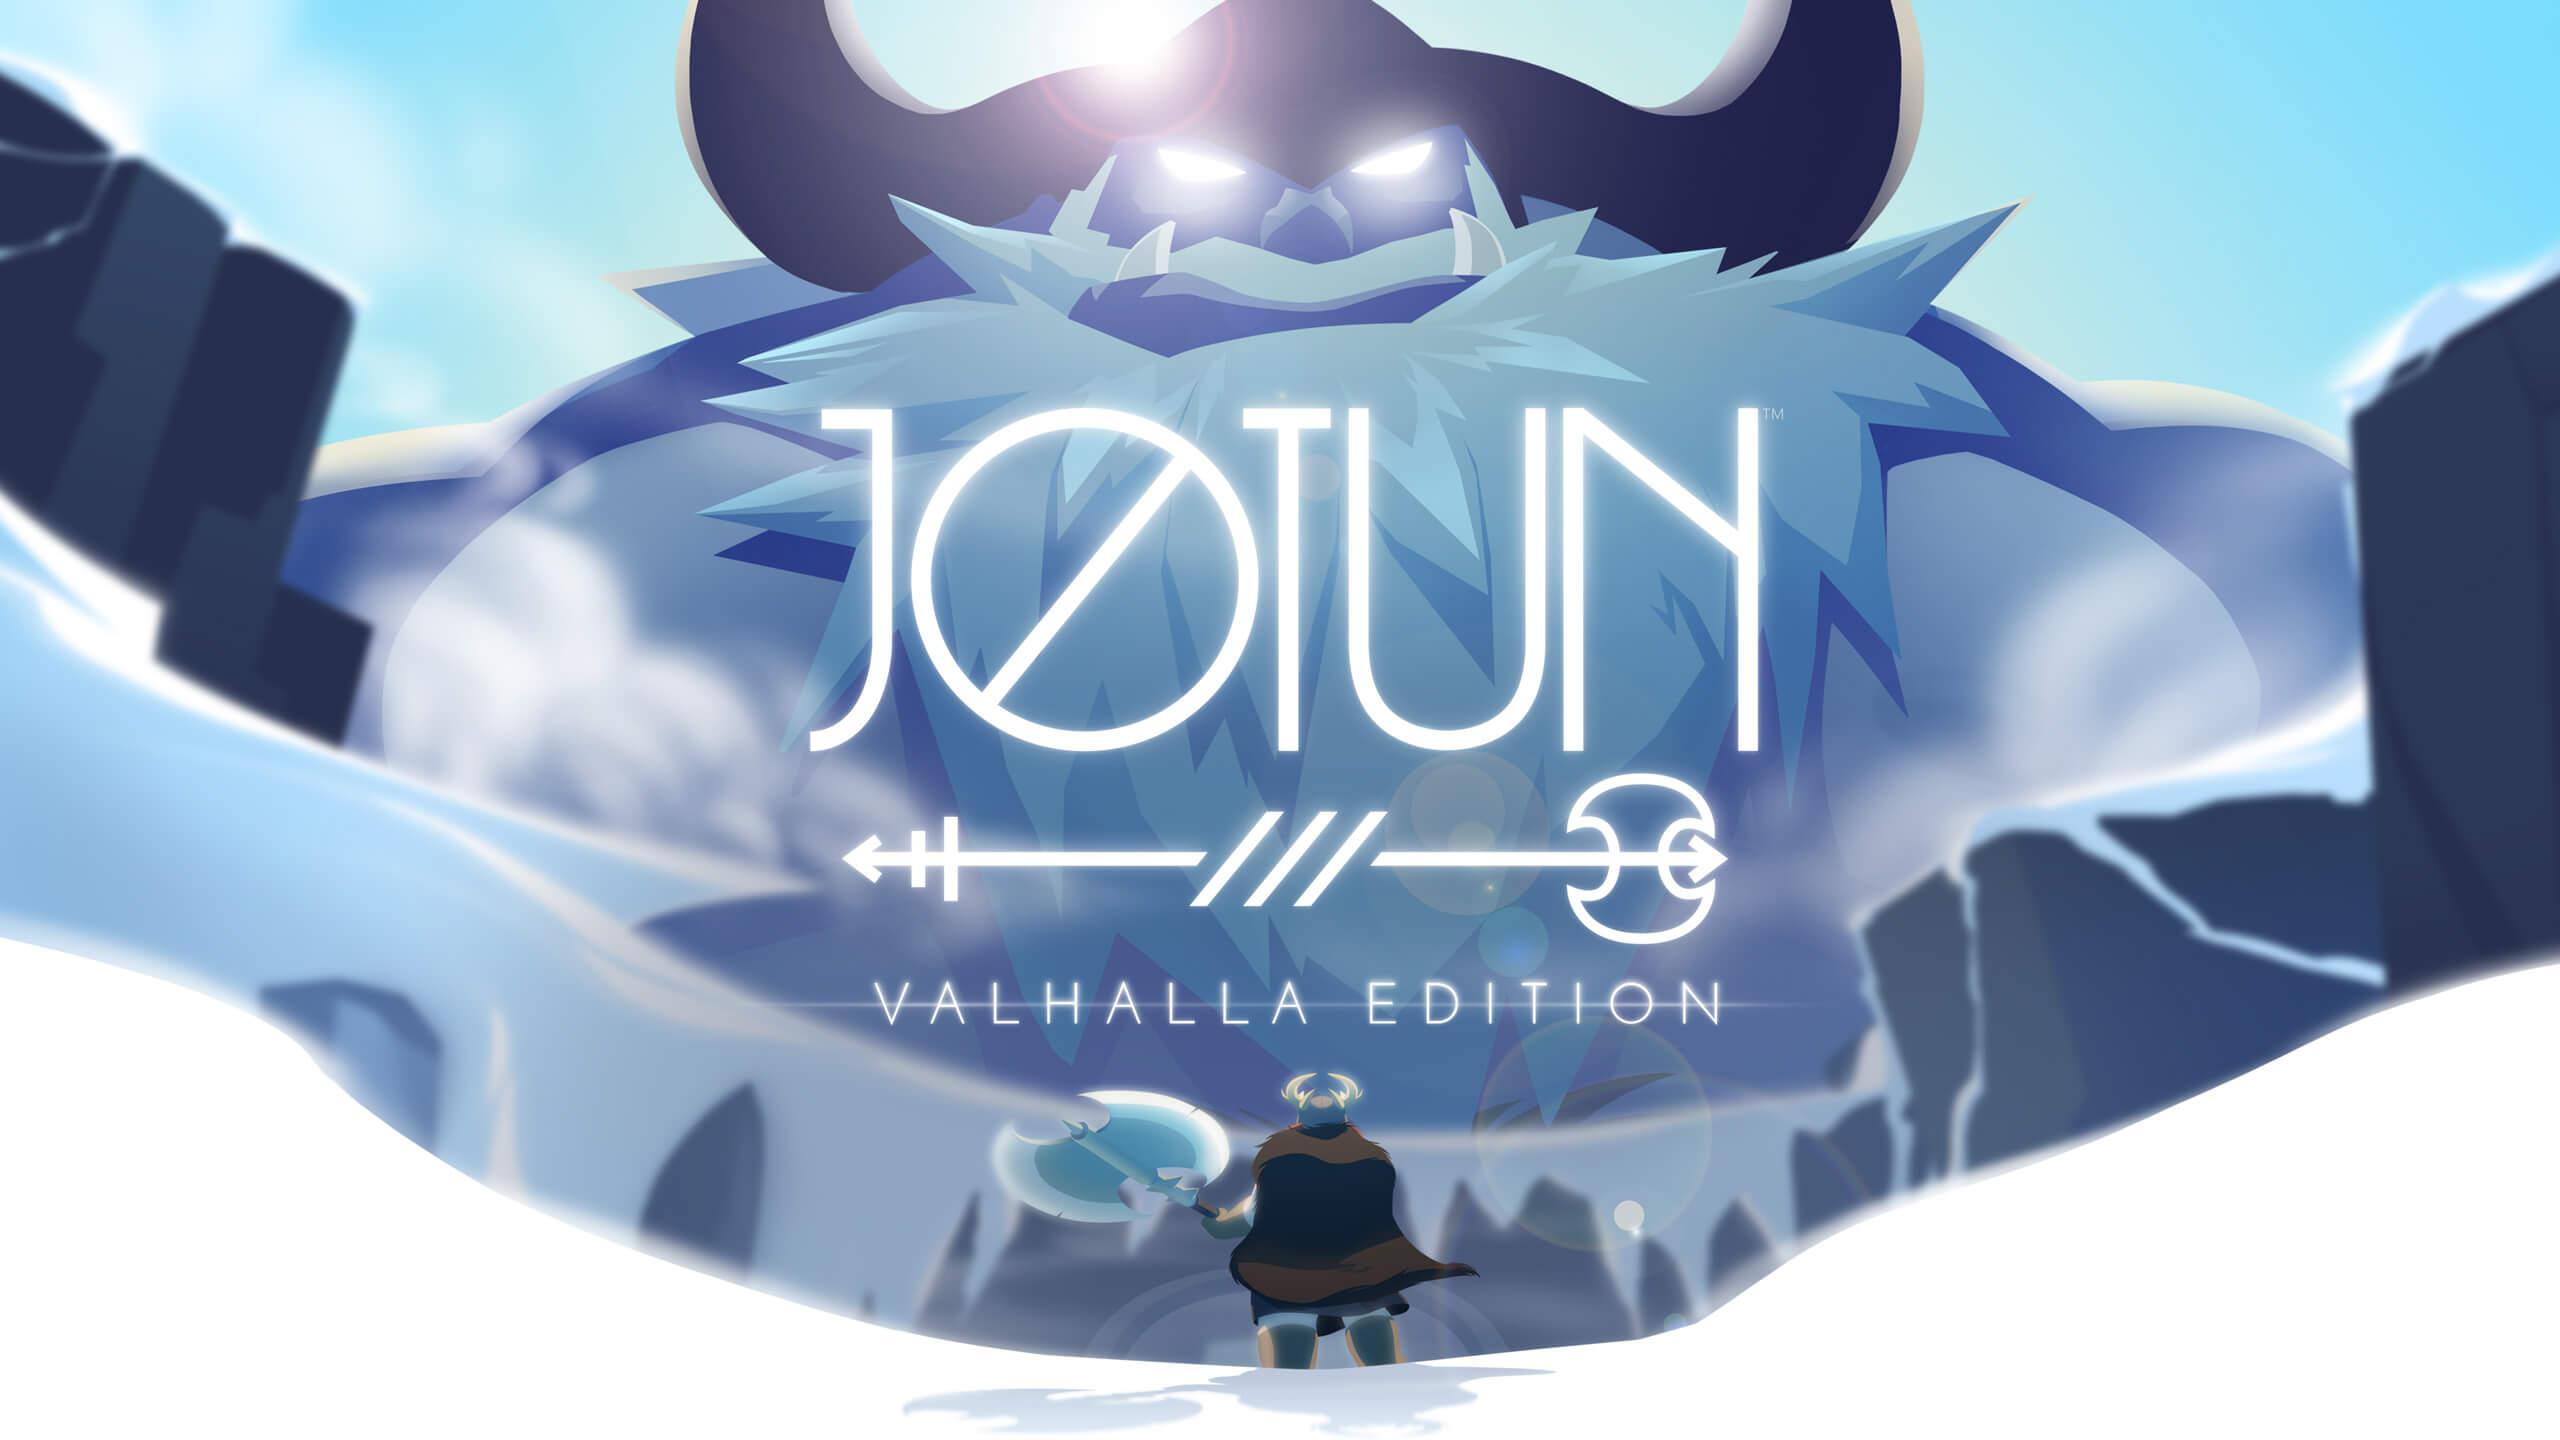 Jotun : Valhalla Edition – Le jeu gratuit de la semaine